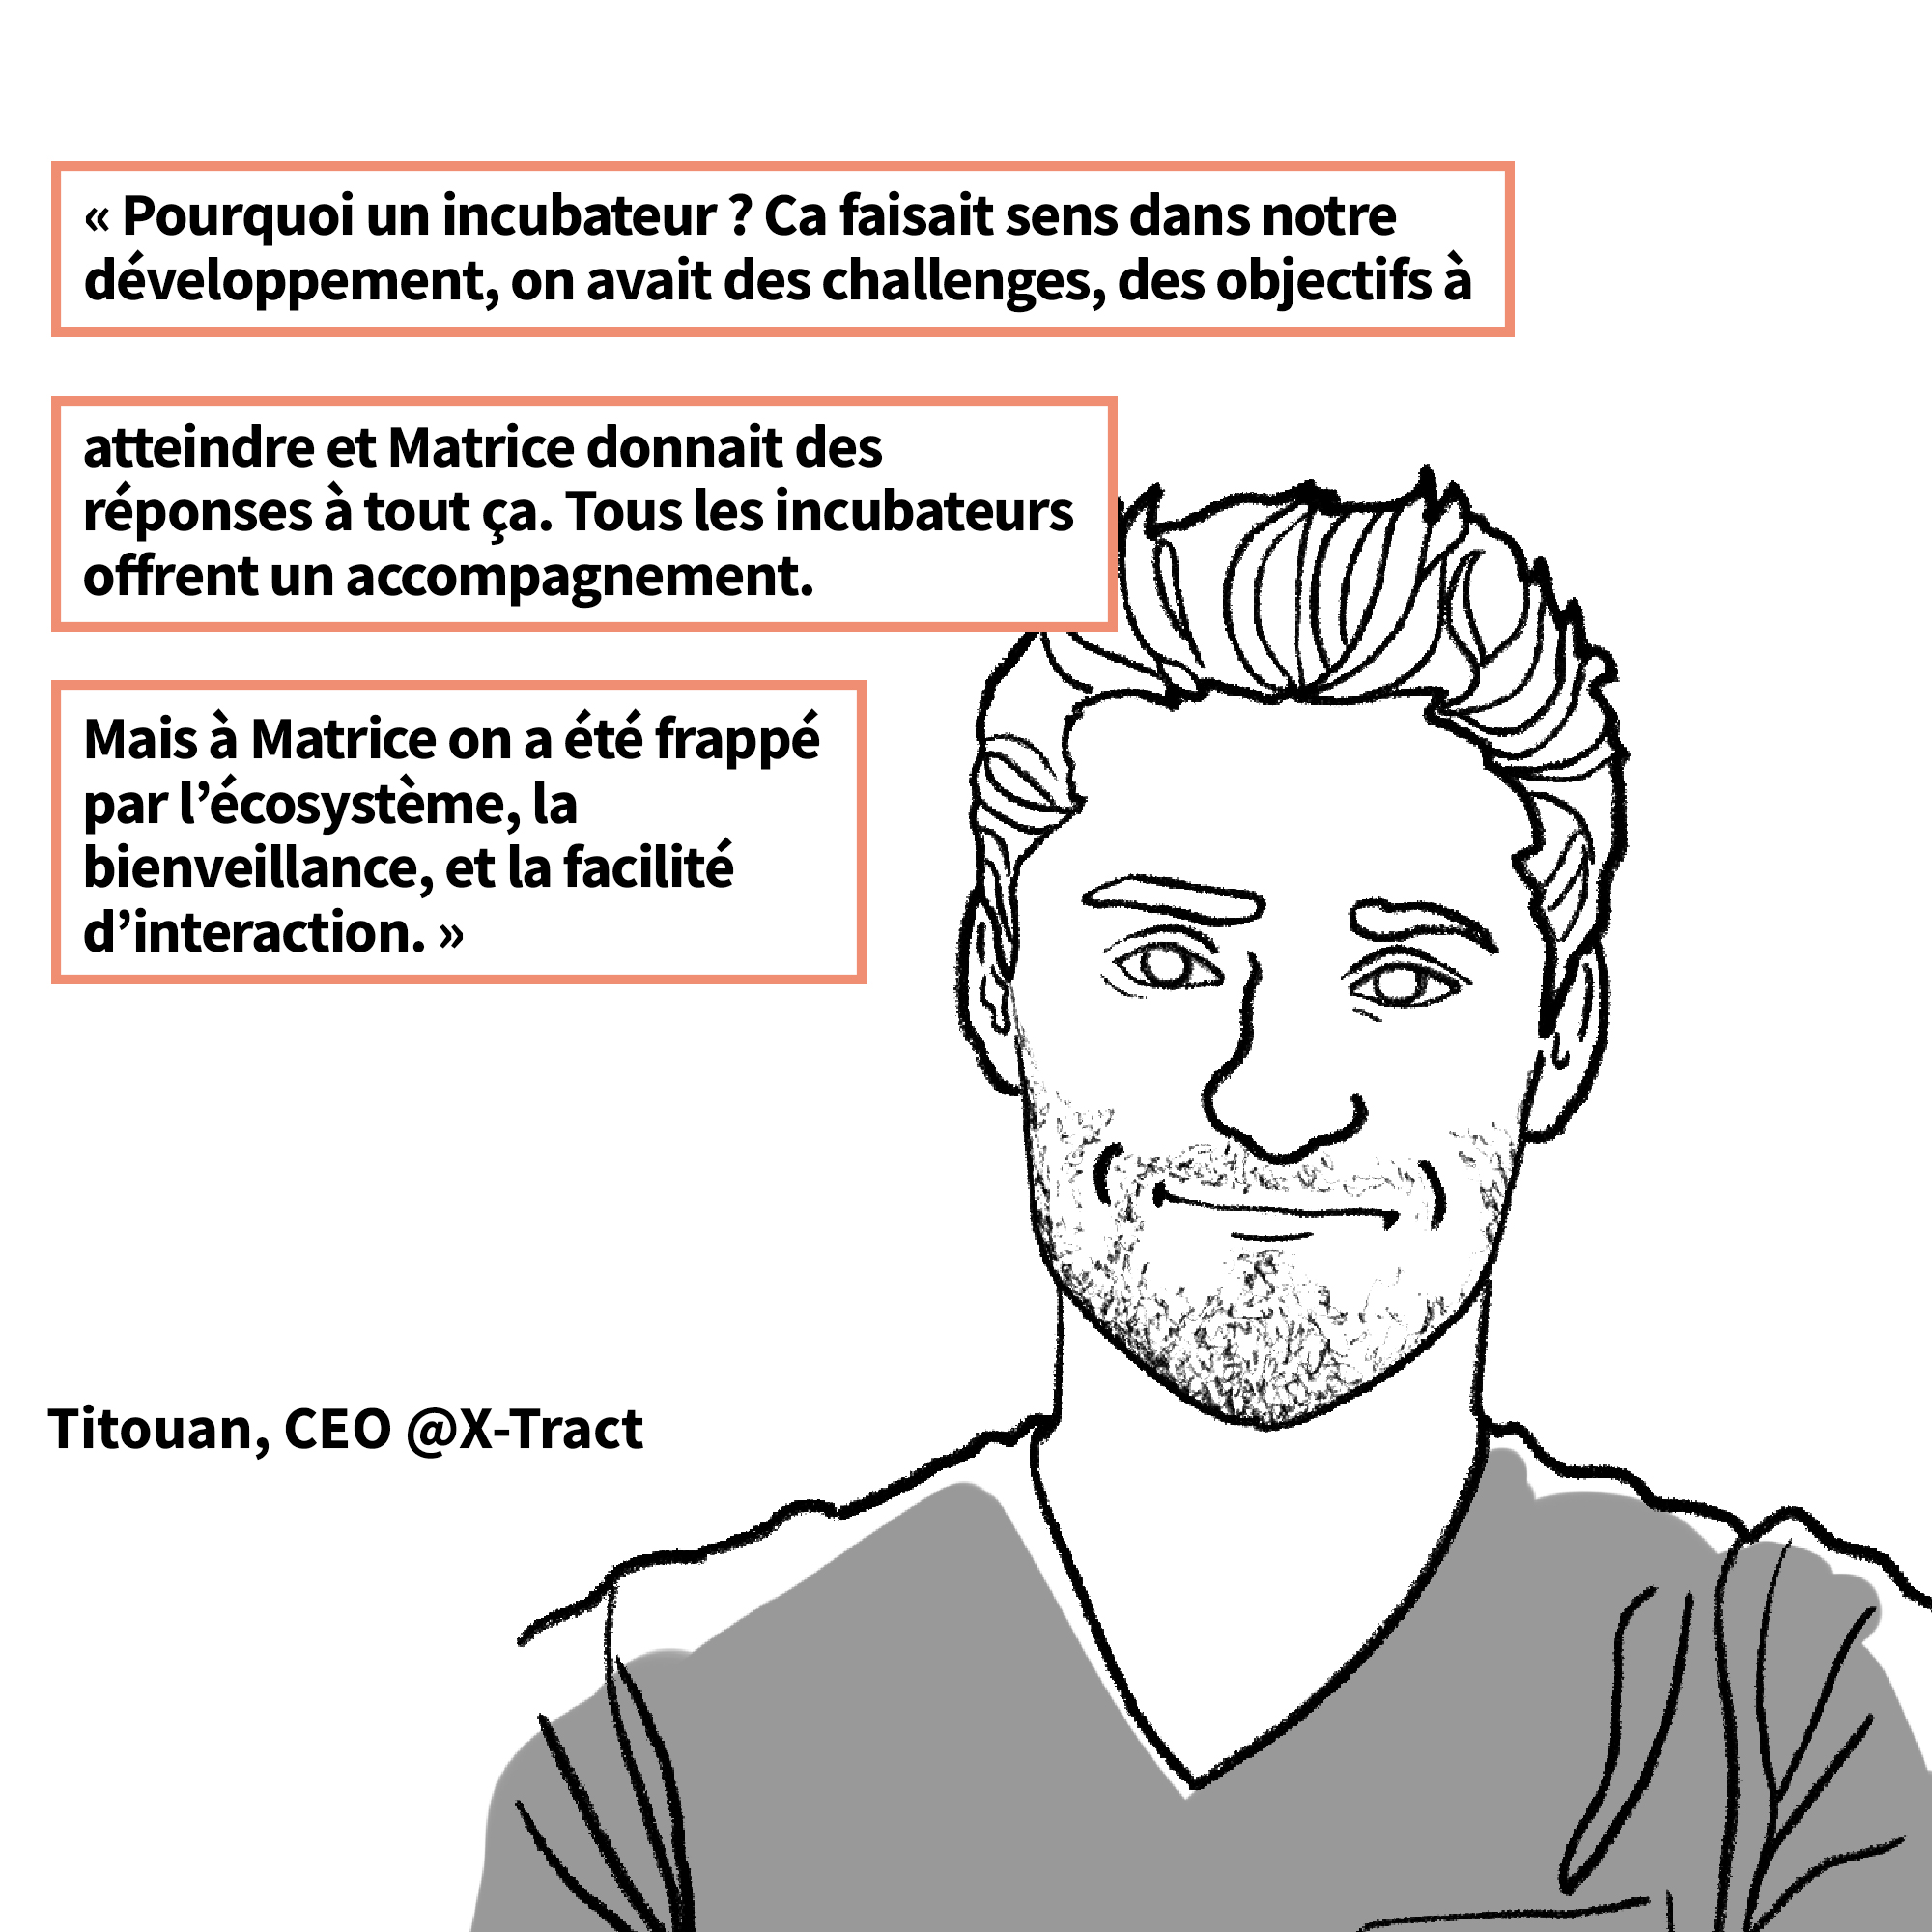 Titouan Parand de la startup X-Tract